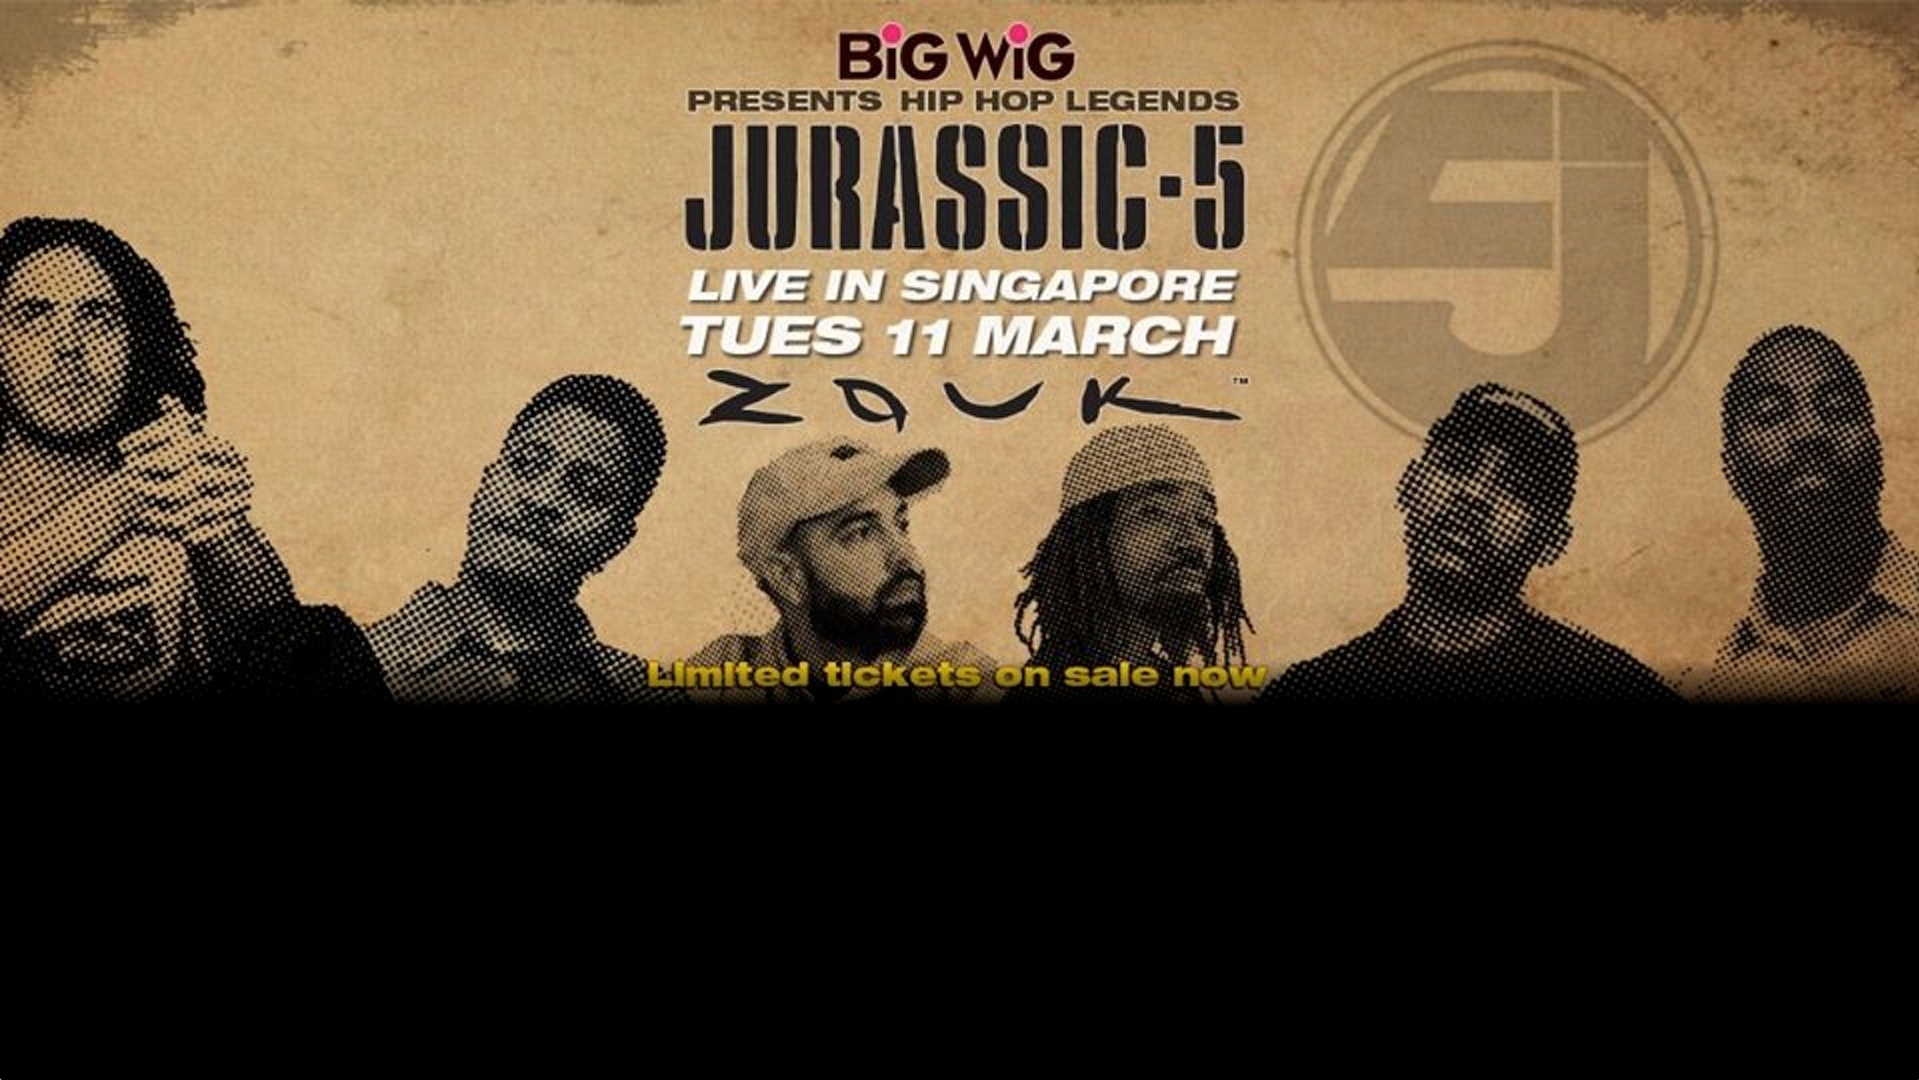 Jurassic 5 Live In Singapore